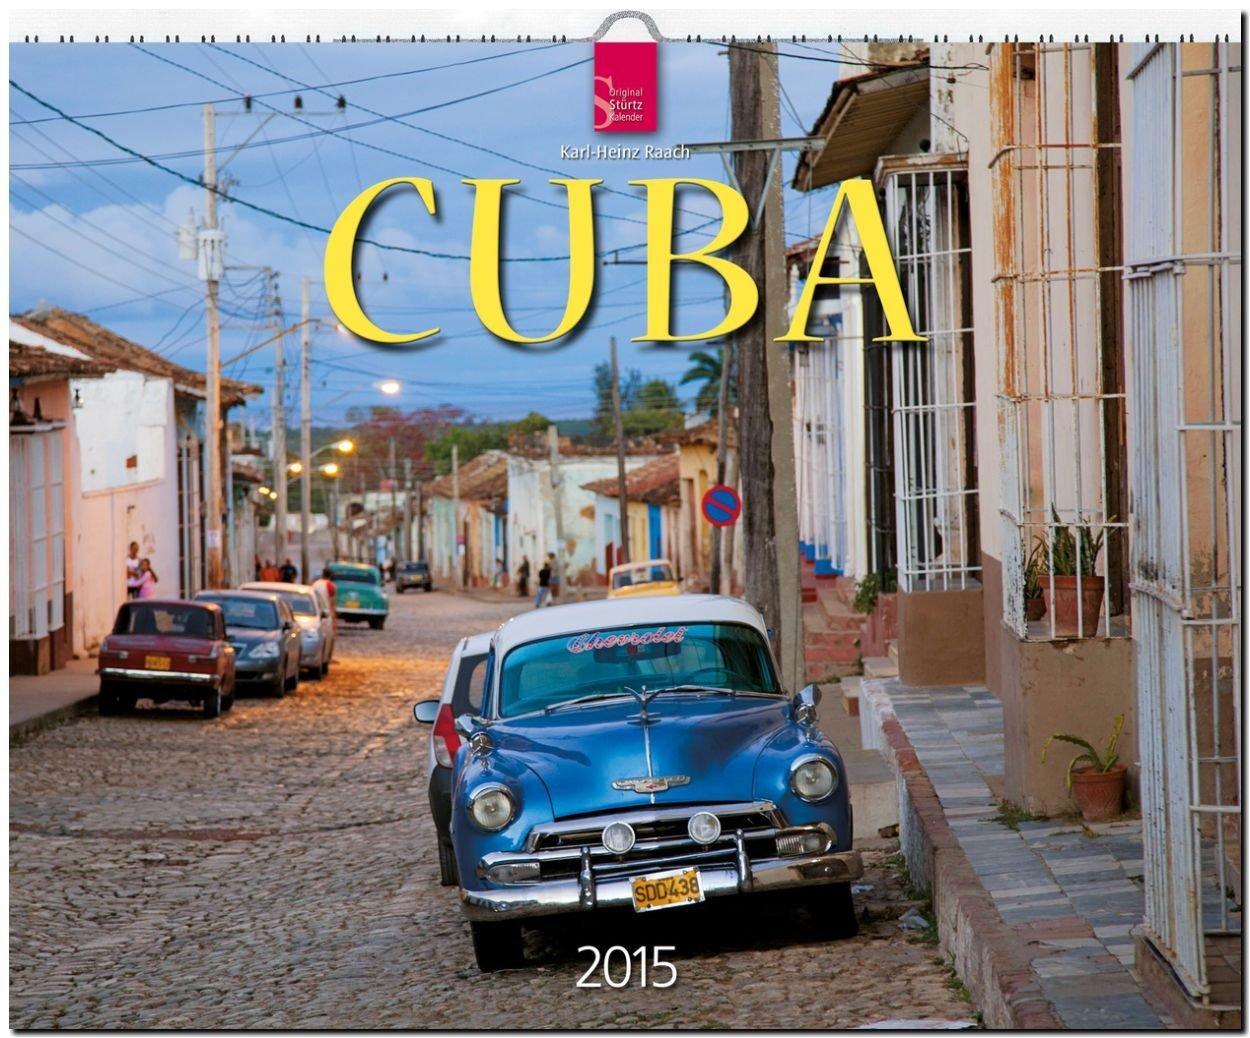 Cuba 2015 - Original Stürtz-Kalender - Großformat 60 x 48 cm